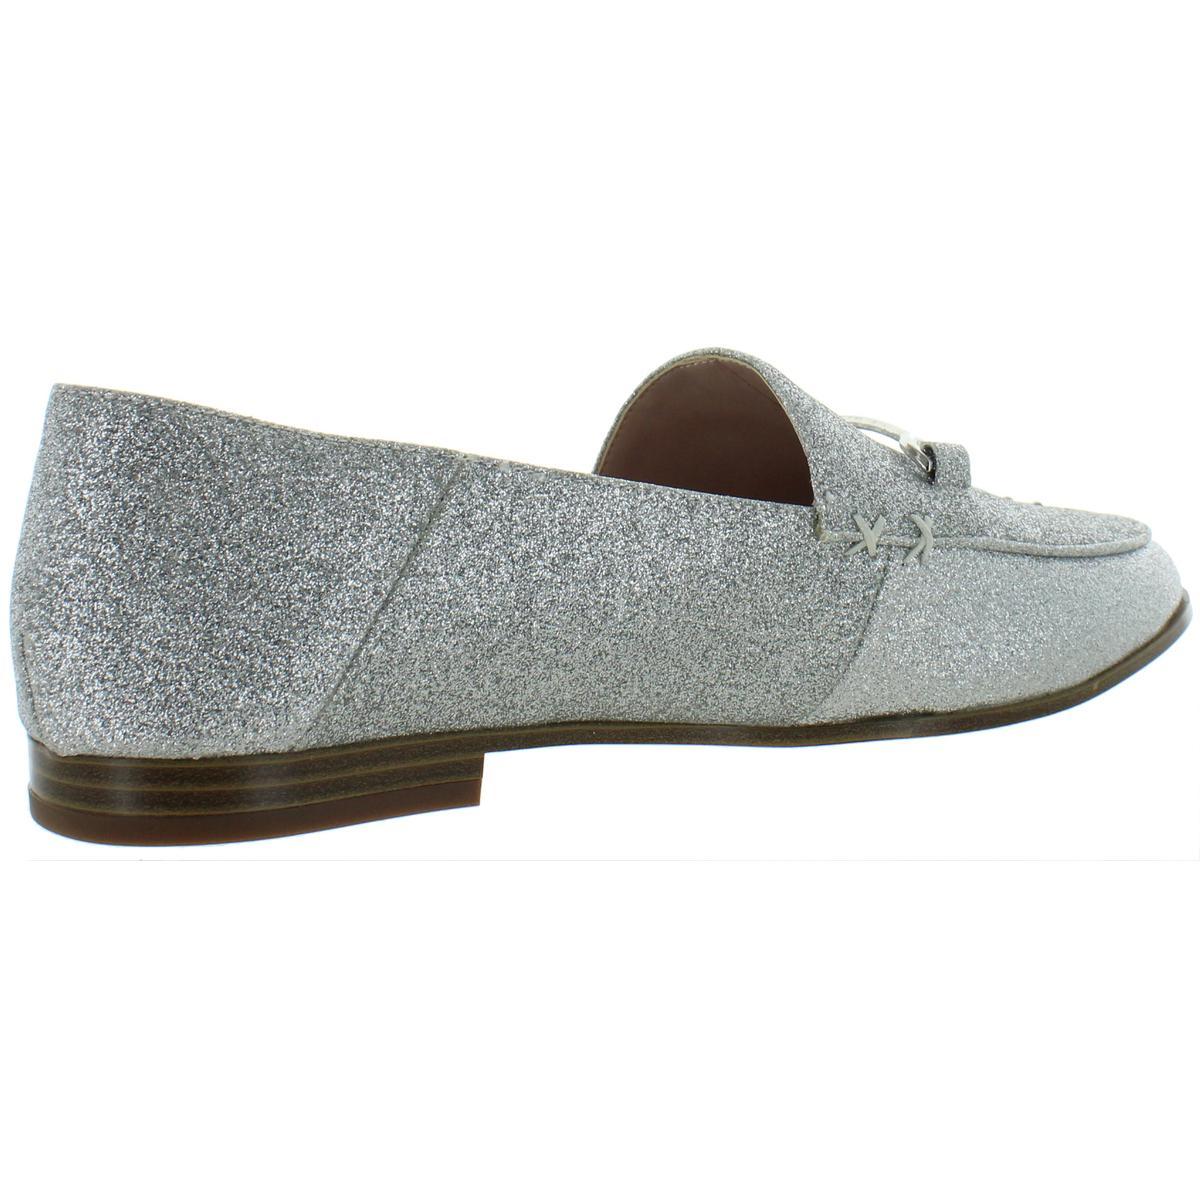 Nine-West-Womens-Wildgirls-Glitter-Slip-On-Embellished-Flats-Shoes-BHFO-8209 thumbnail 6